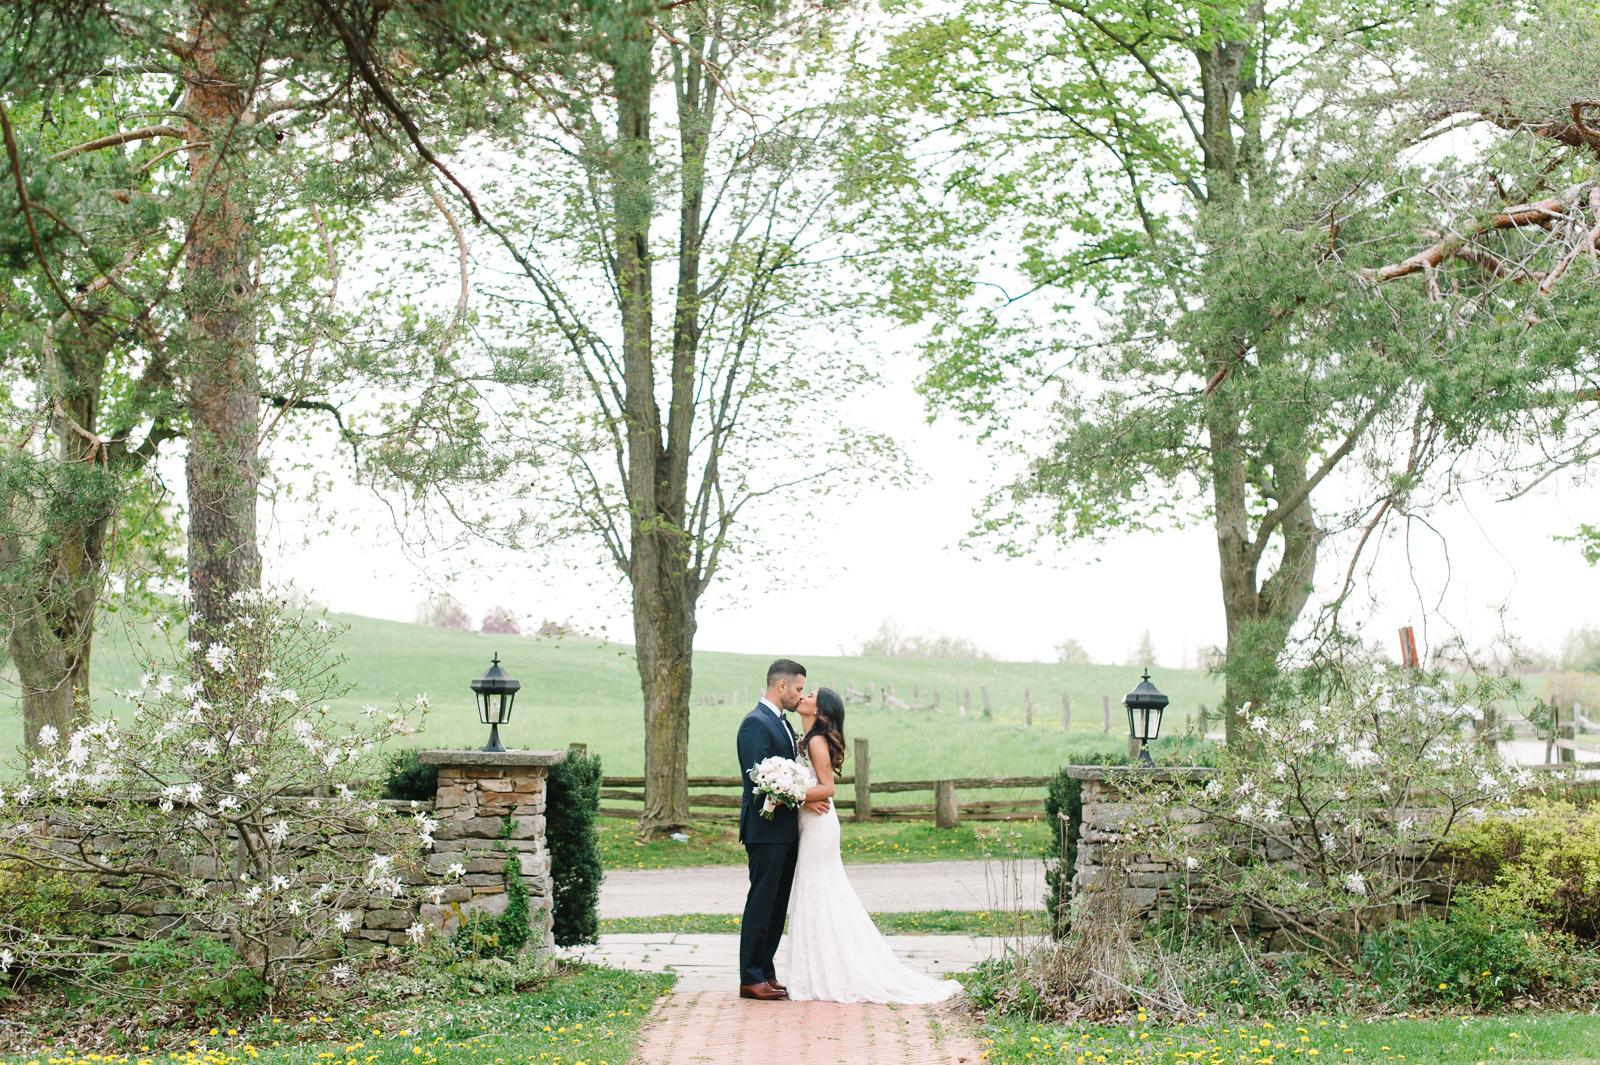 tara-mcmullen-photography-toronto-wedding-photography-alderlea-mansion-wedding-alderlea-wedding-brampton-scotsdale-farm-wedding-reem-acra-wedding-014